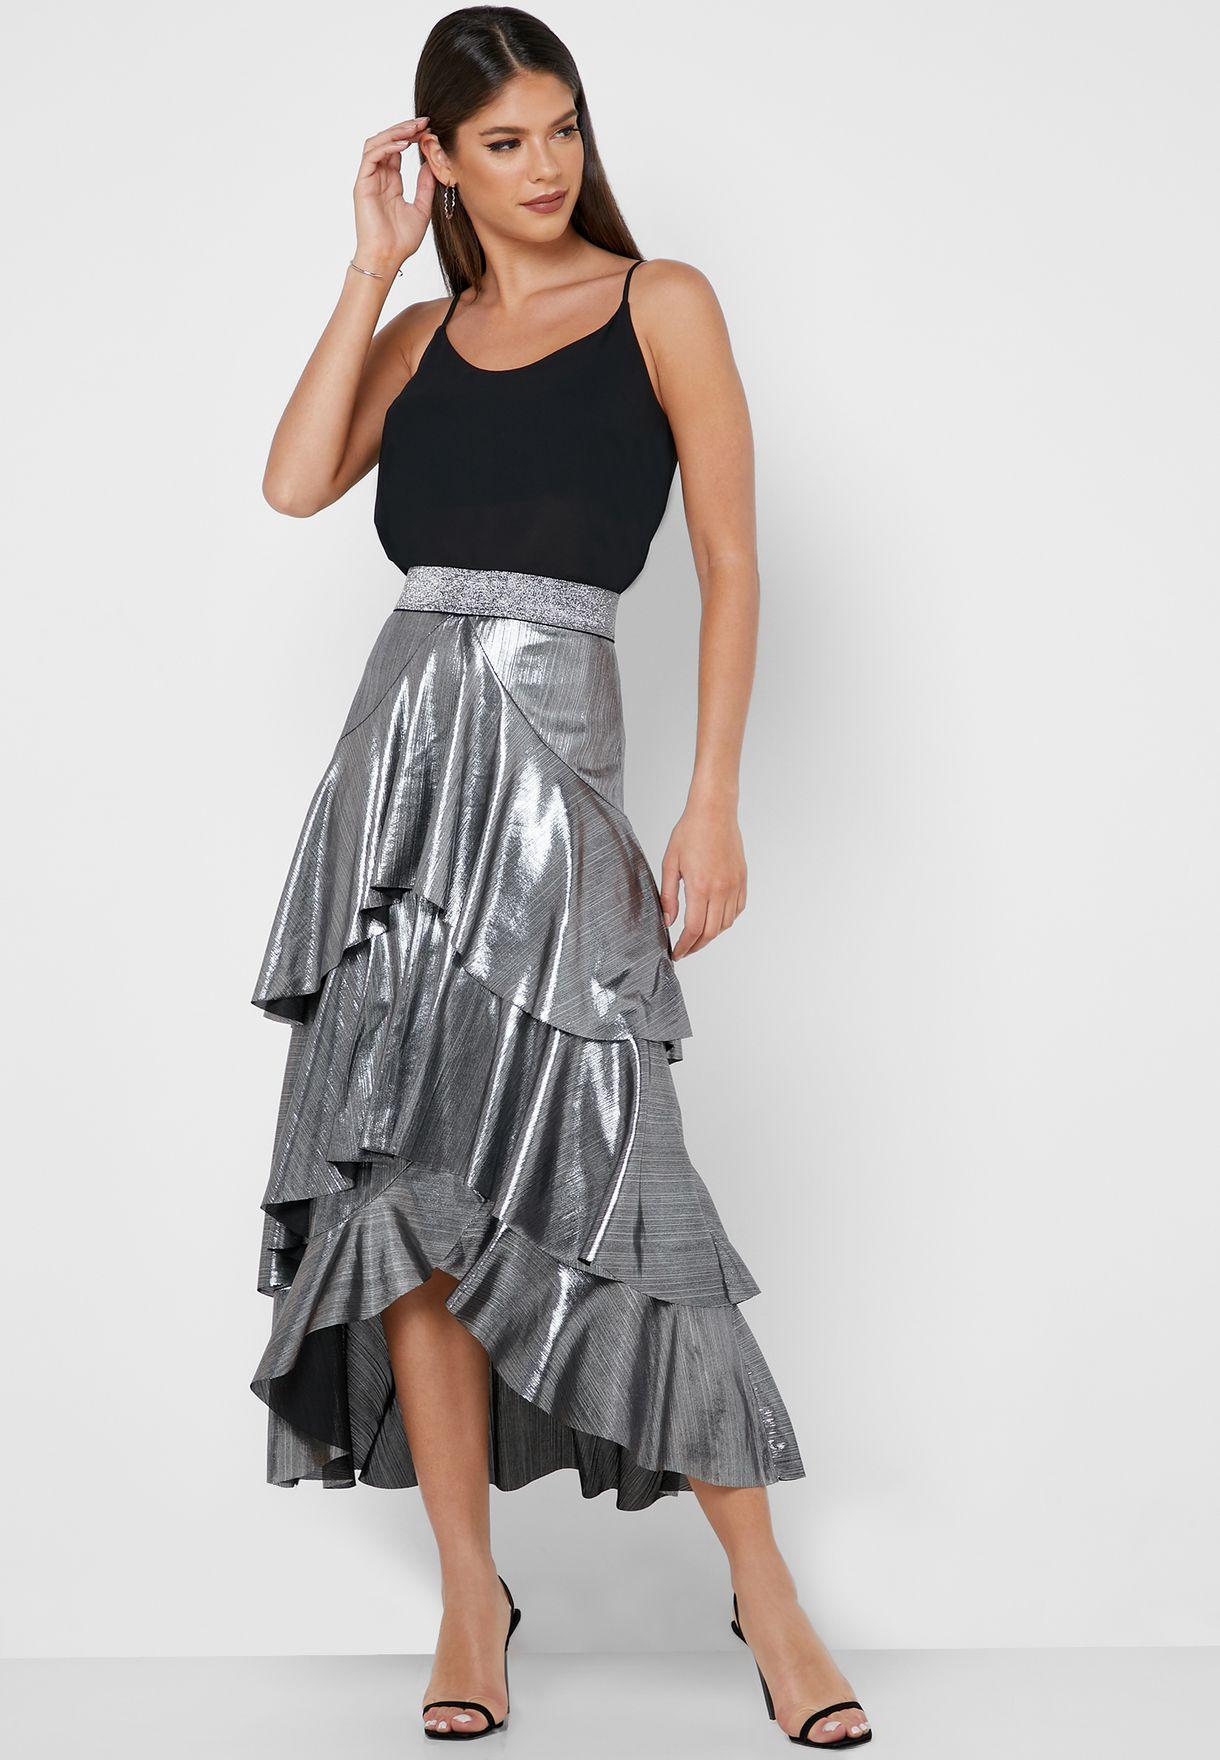 Shimmer Tiered Skirt